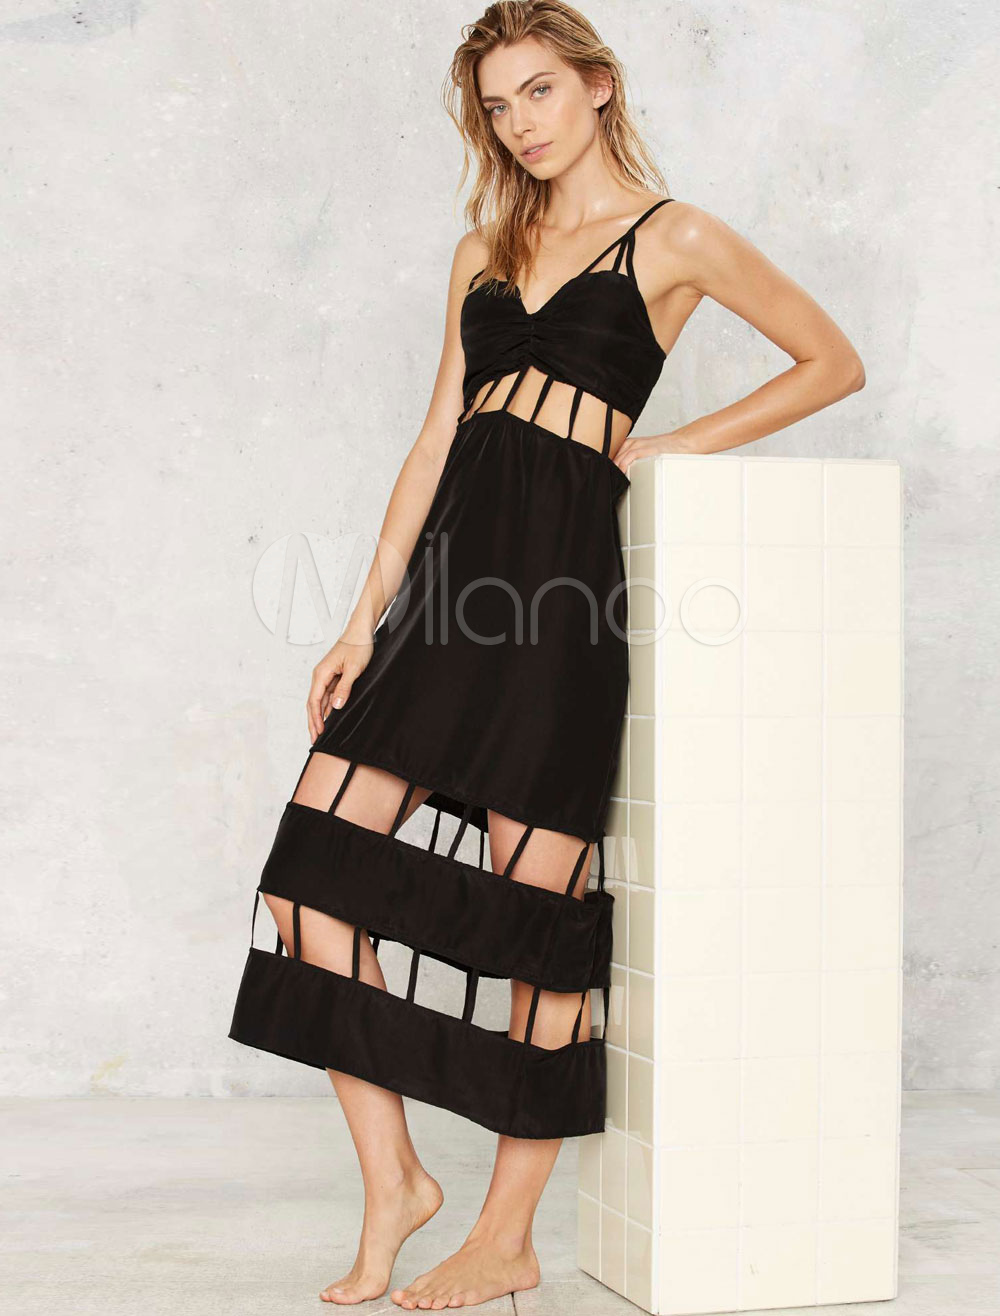 Black Maxi Dress V-neck Cut Out Women's Long Slip Dress (Women\\'s Clothing Maxi Dresses) photo